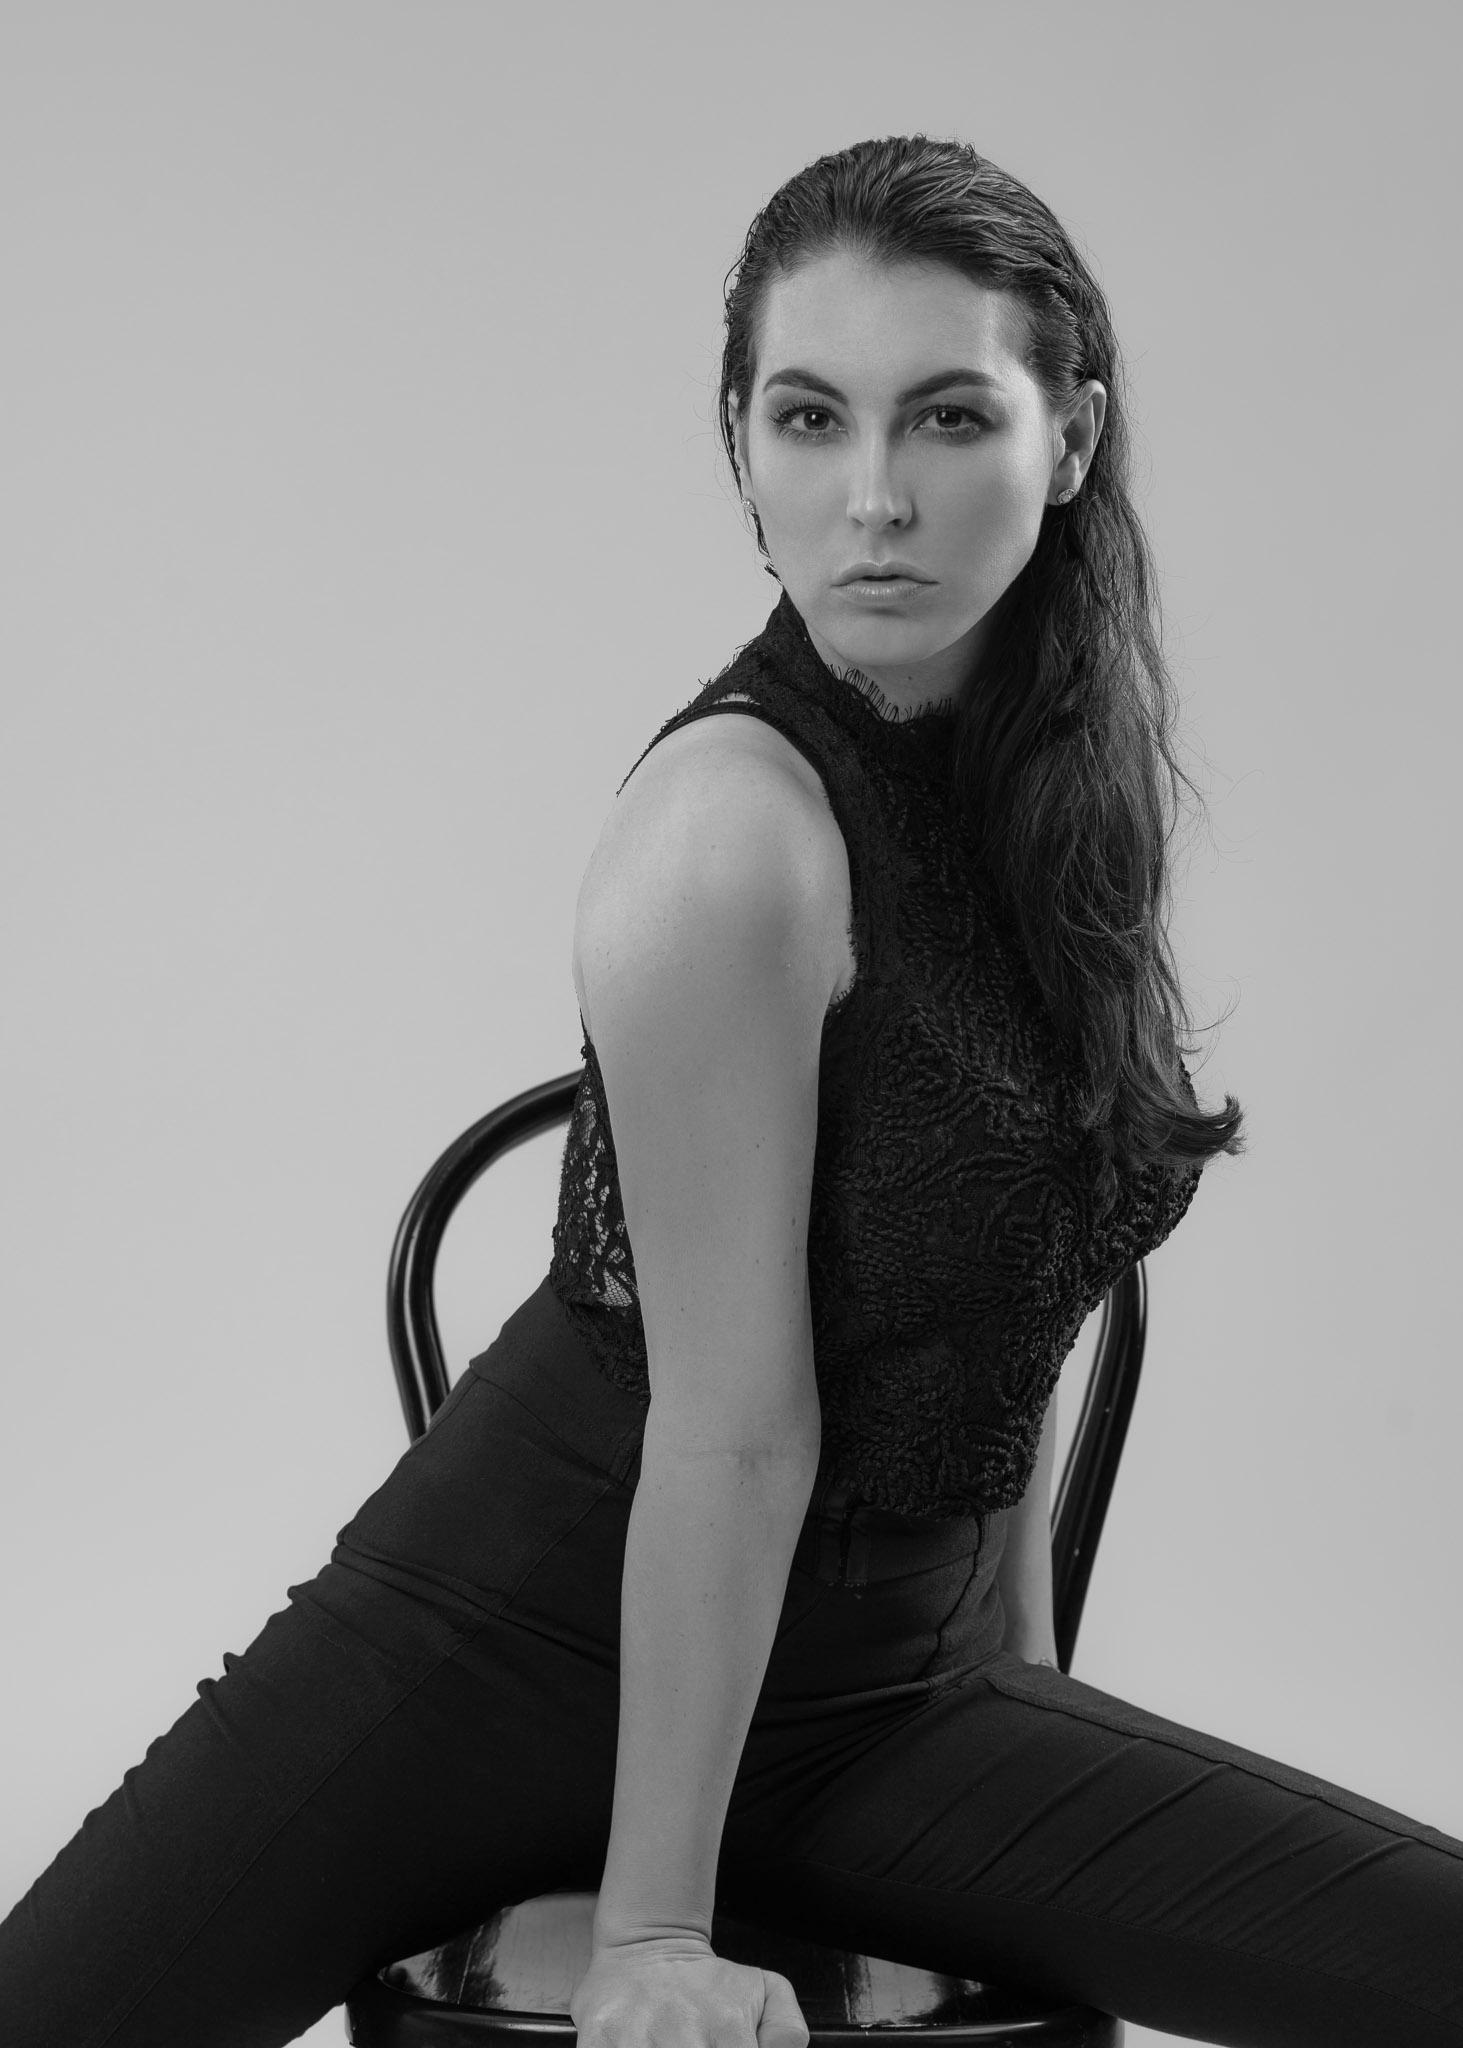 Photo: Benedikt Haushofer/Model: Eva Wilhelmer